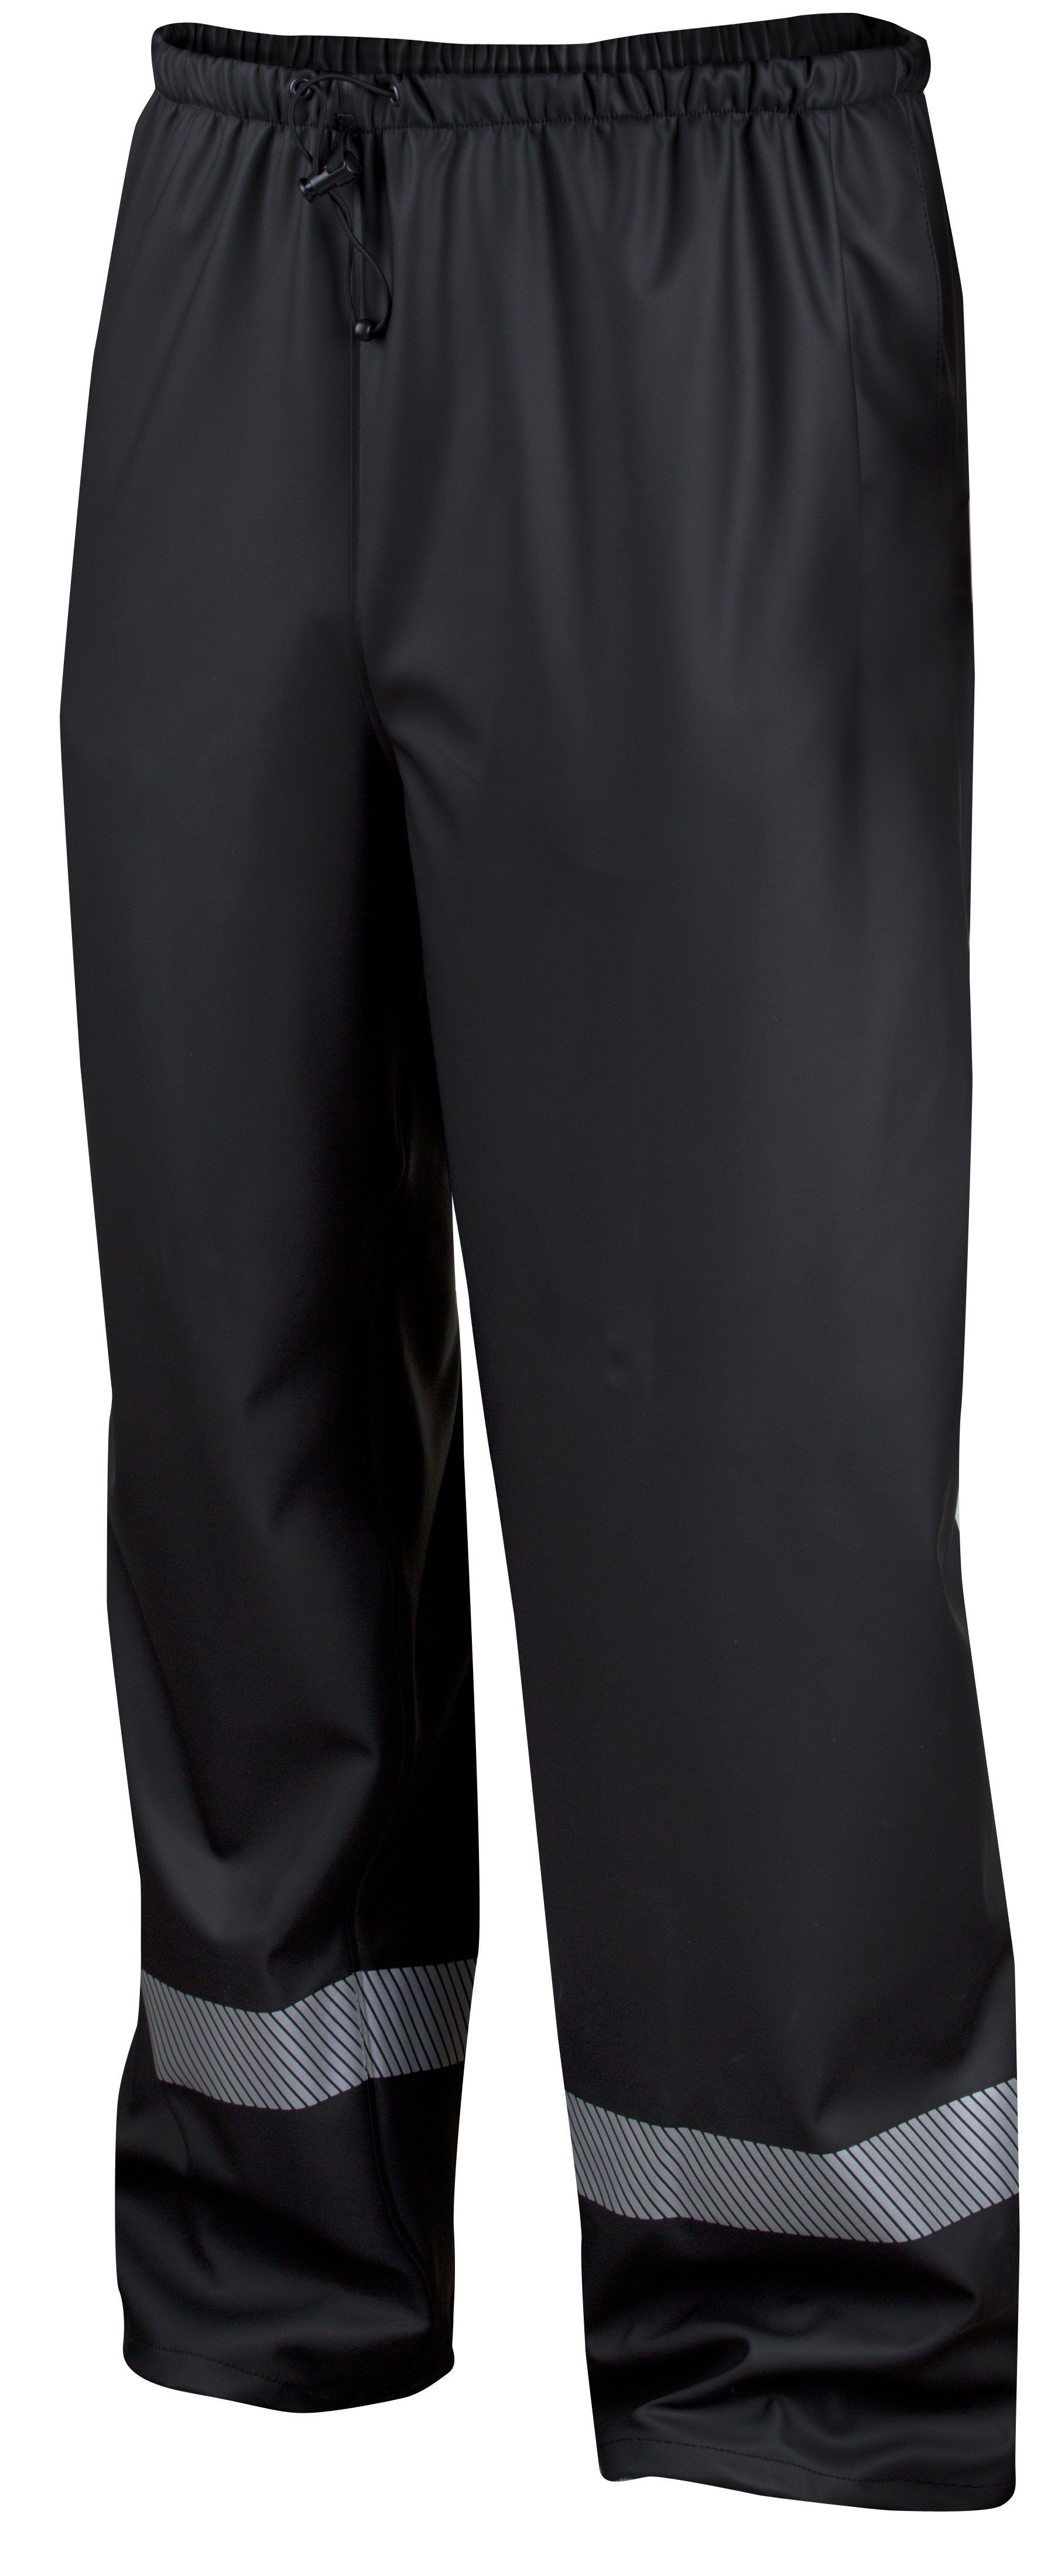 4530 Rain trousers